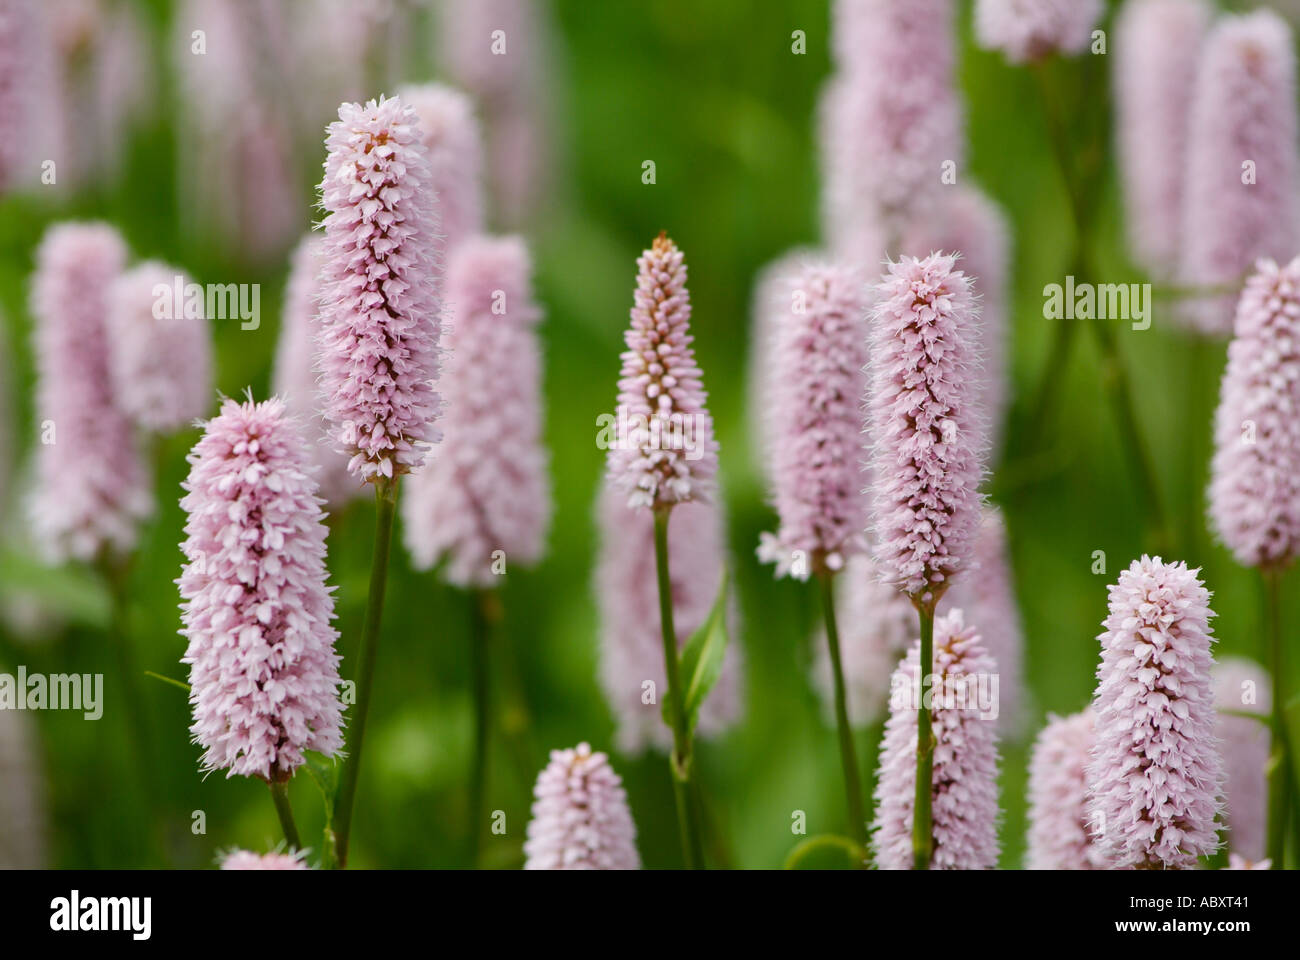 Delicate Pink Flowers Persicaria Bistorta Stock Photos Delicate